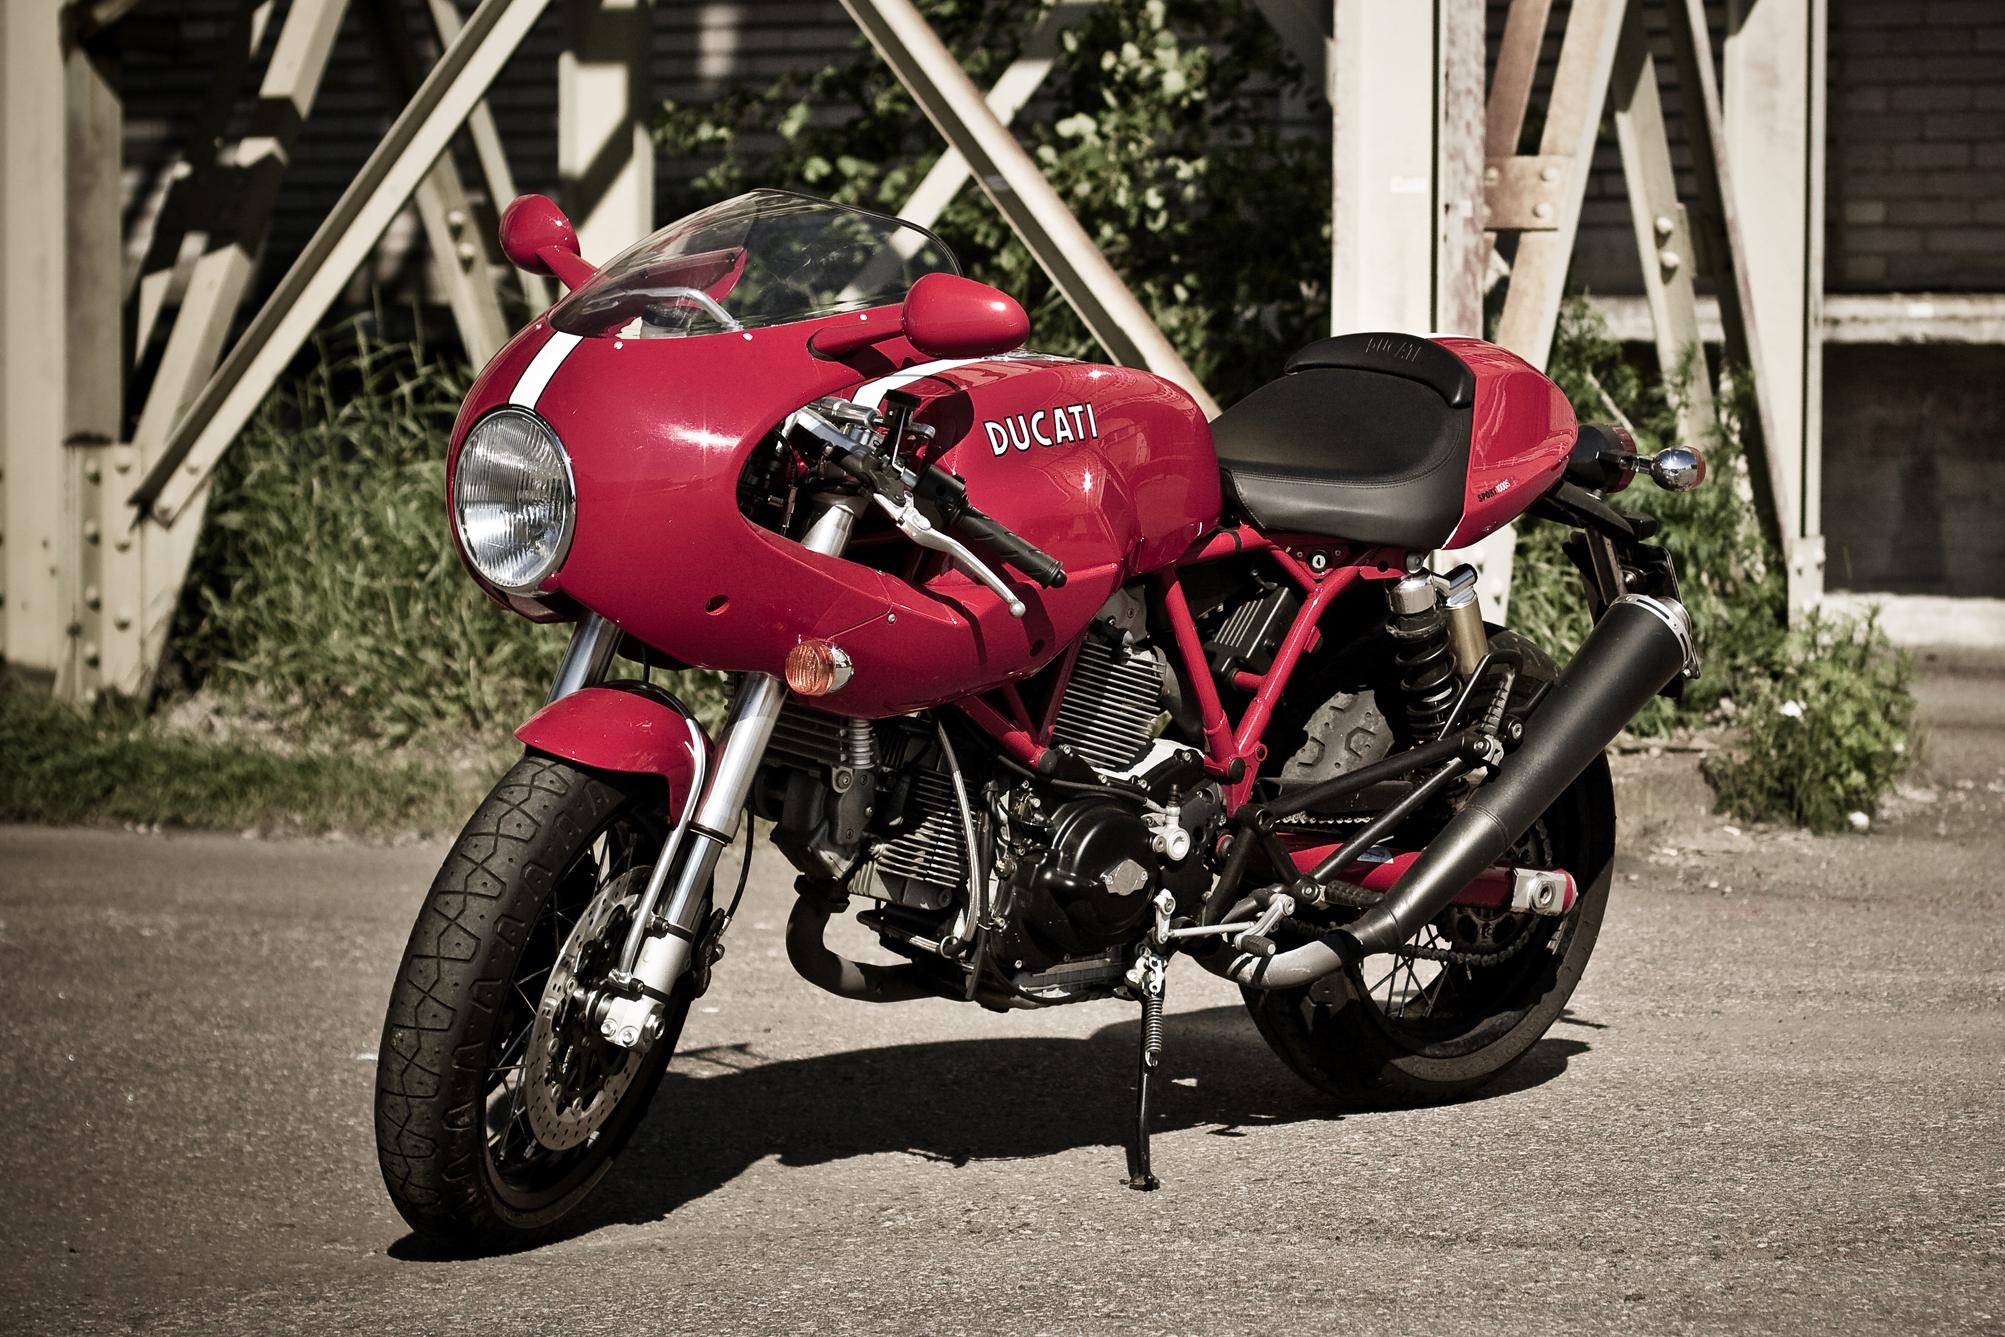 Ducati Classic For Sale Uk